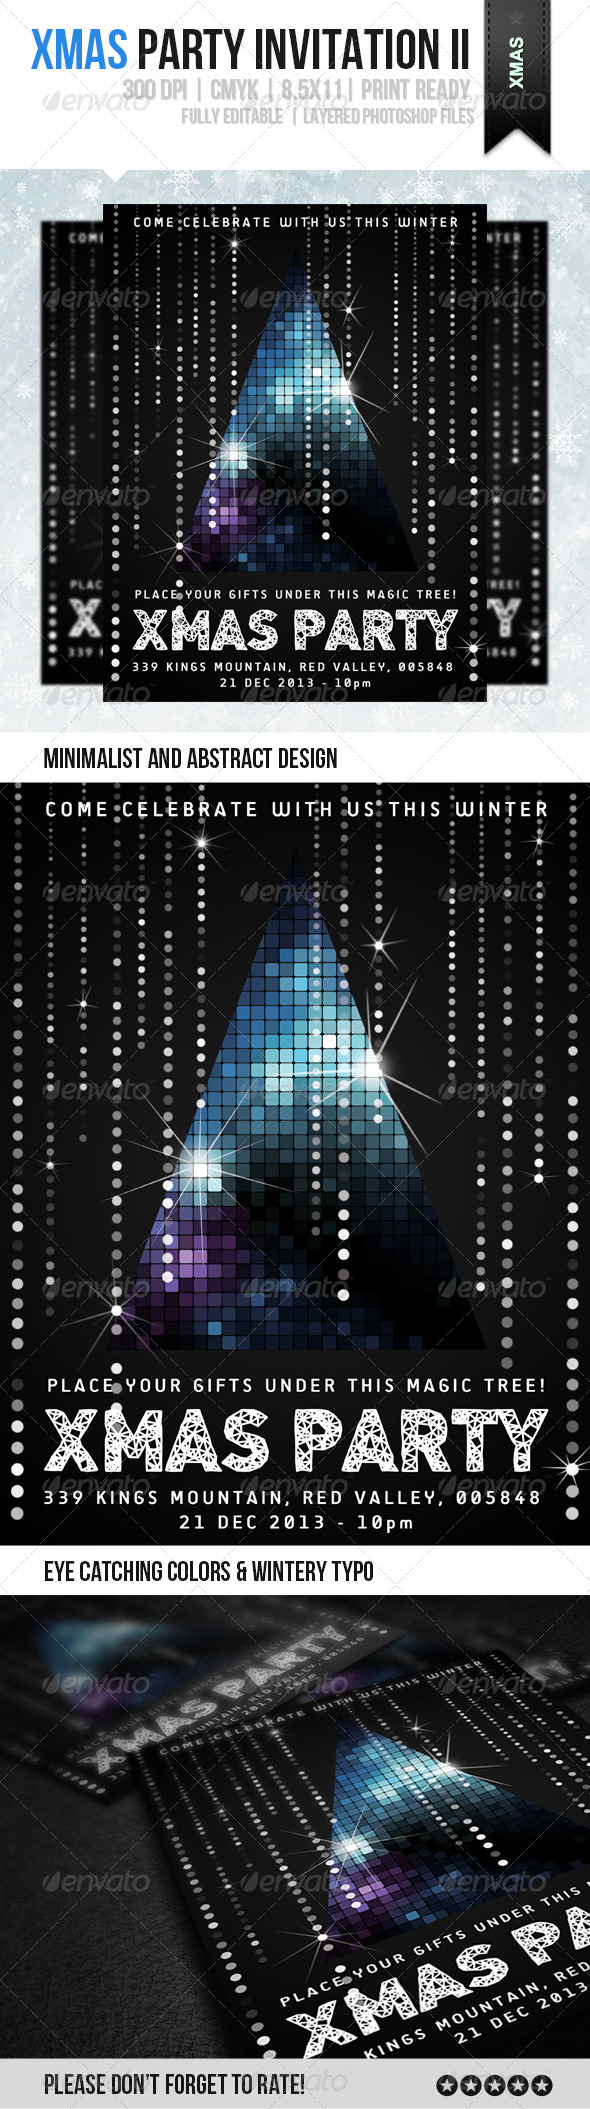 GraphicRiver xMas Party Invitation III 6058287